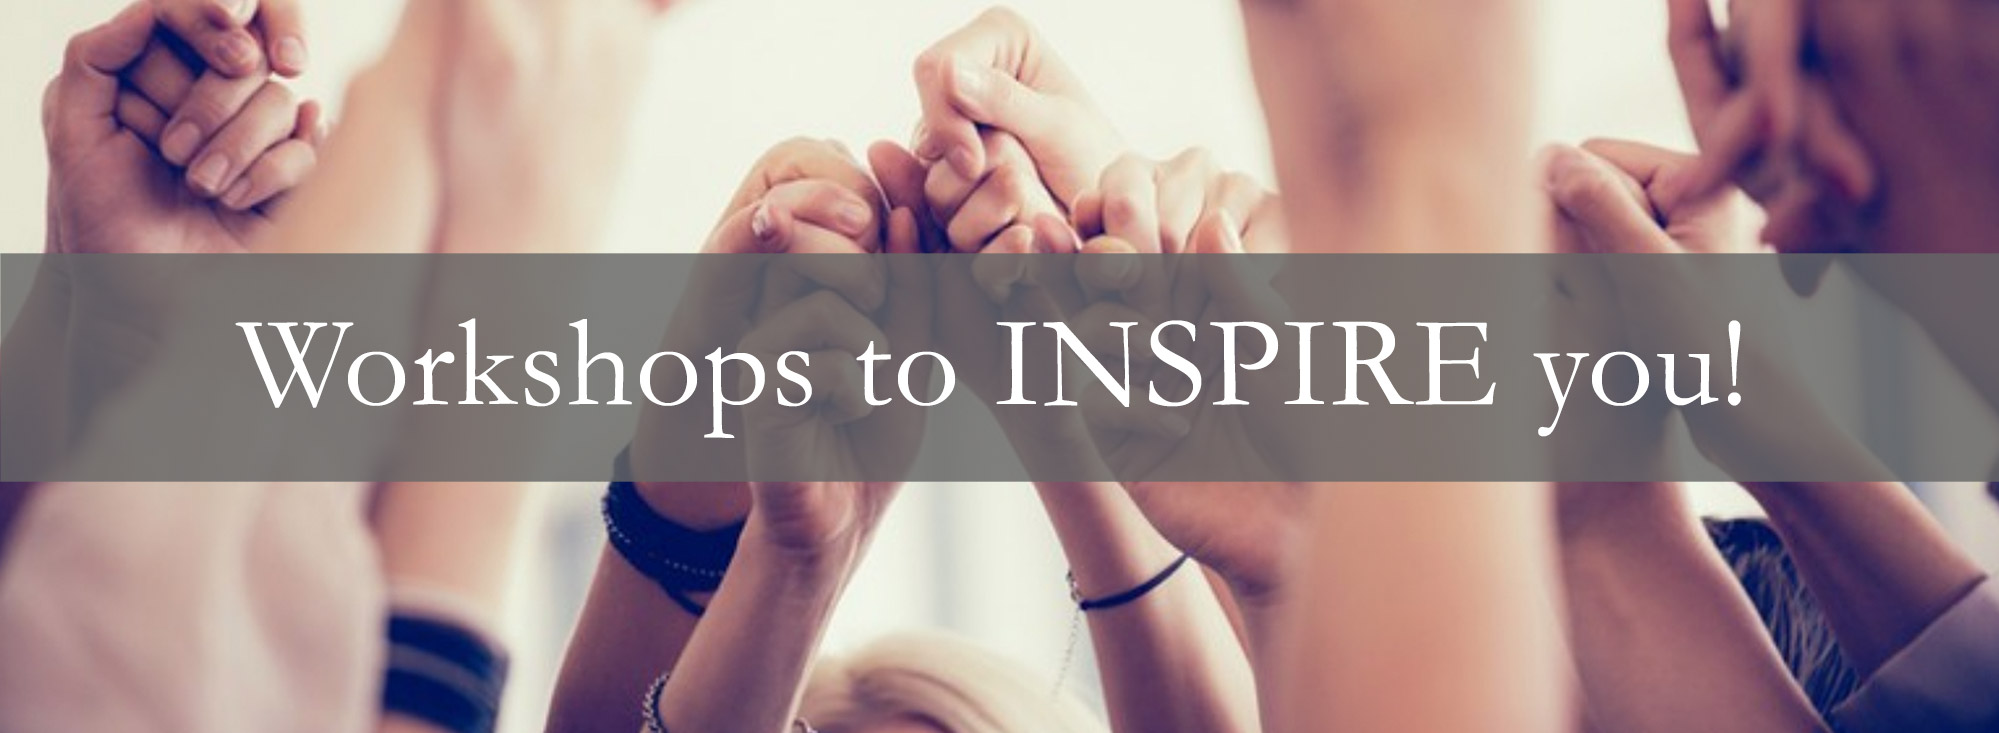 Inspire Workshops